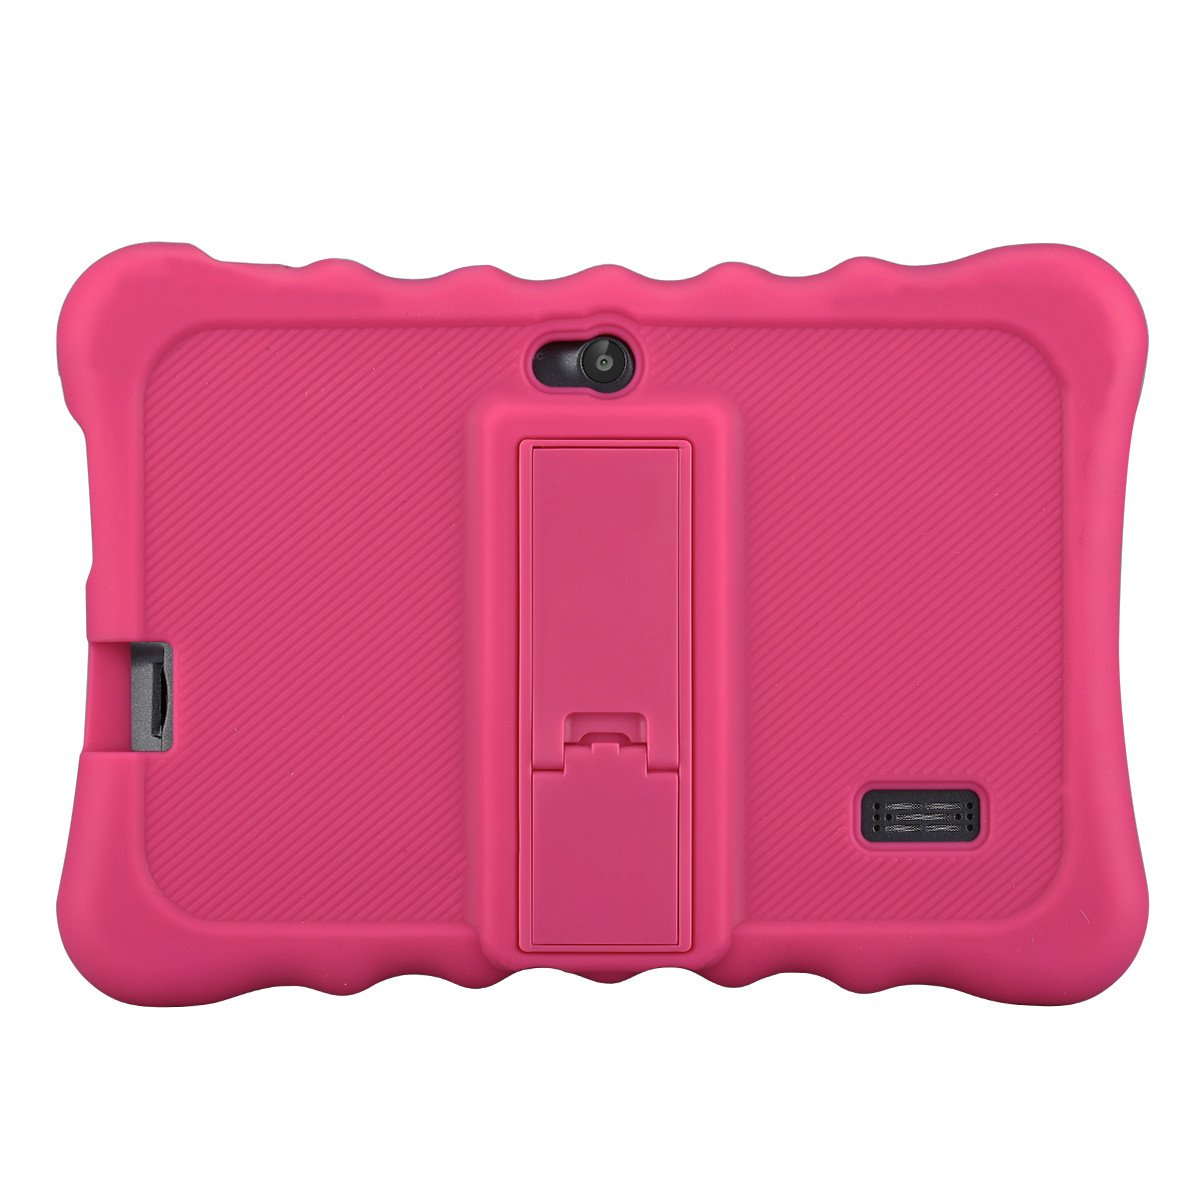 Ainol Q88 Android 7.1 RK3126C Quad Core 1GB+16GB 0.3MP+0.3MP Cam WiFi 2800Ah Tablet PC--Pink by Ainol Q88 (Image #7)